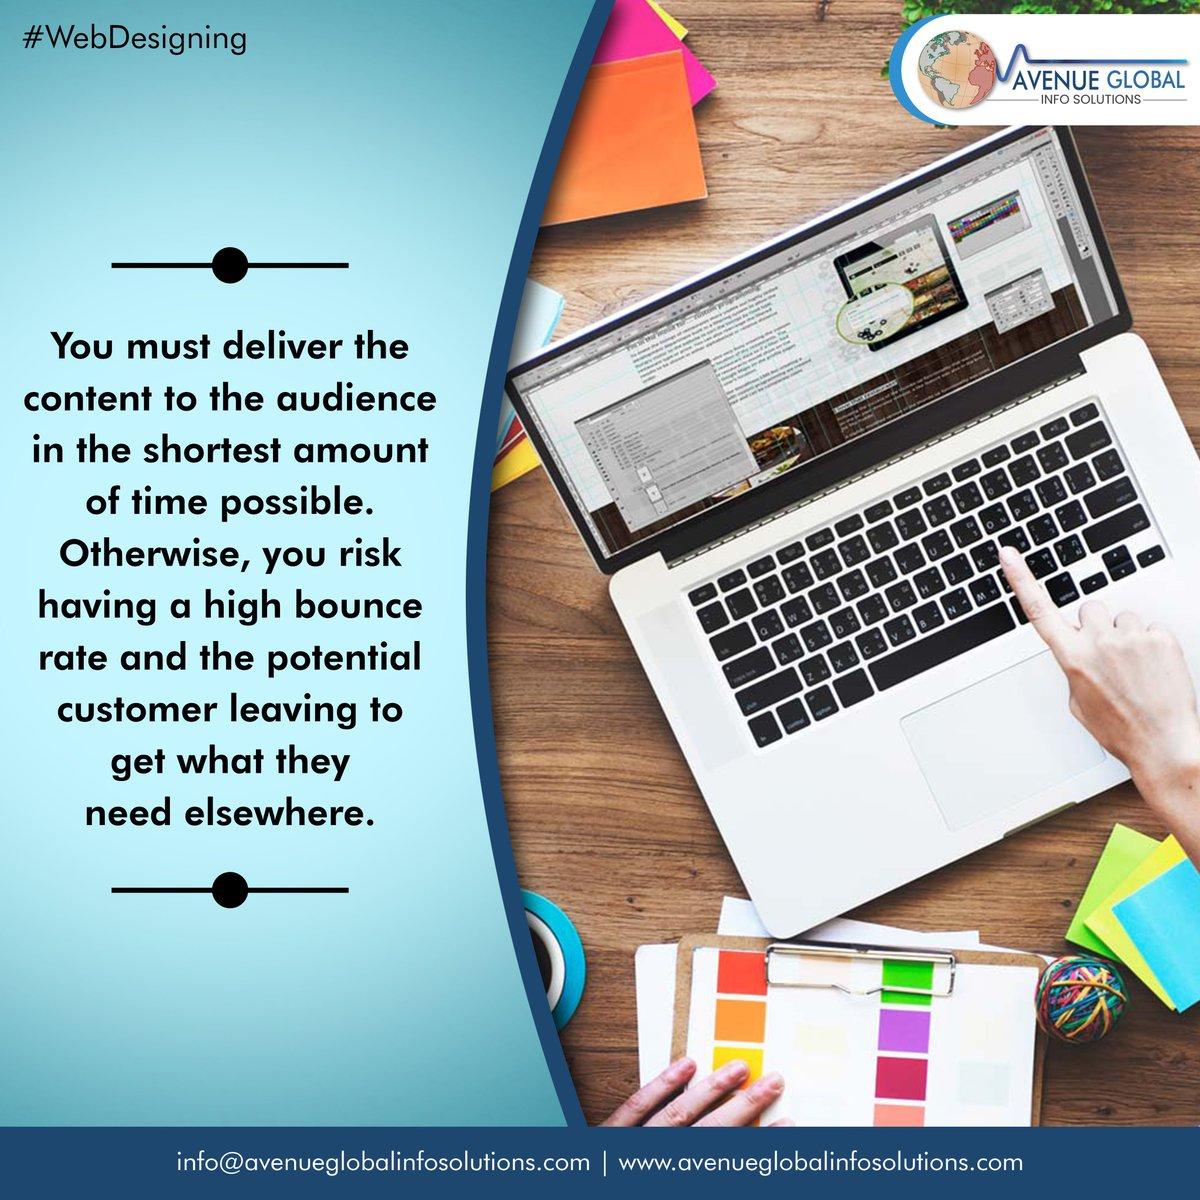 Webdesigning tips!!  #content #whywebdevelopment #webdesigncompany #websitedeveloper #webdesigntips #instatech #instatechno #socialmediamarketing #Avenueglobalinfosolutions #avenueglobal #AGIS #Webdesigning #Digitalmarketing #Websitedevelopment #websitebuilder #ITcompany #Punepic.twitter.com/9rYl6blJvt